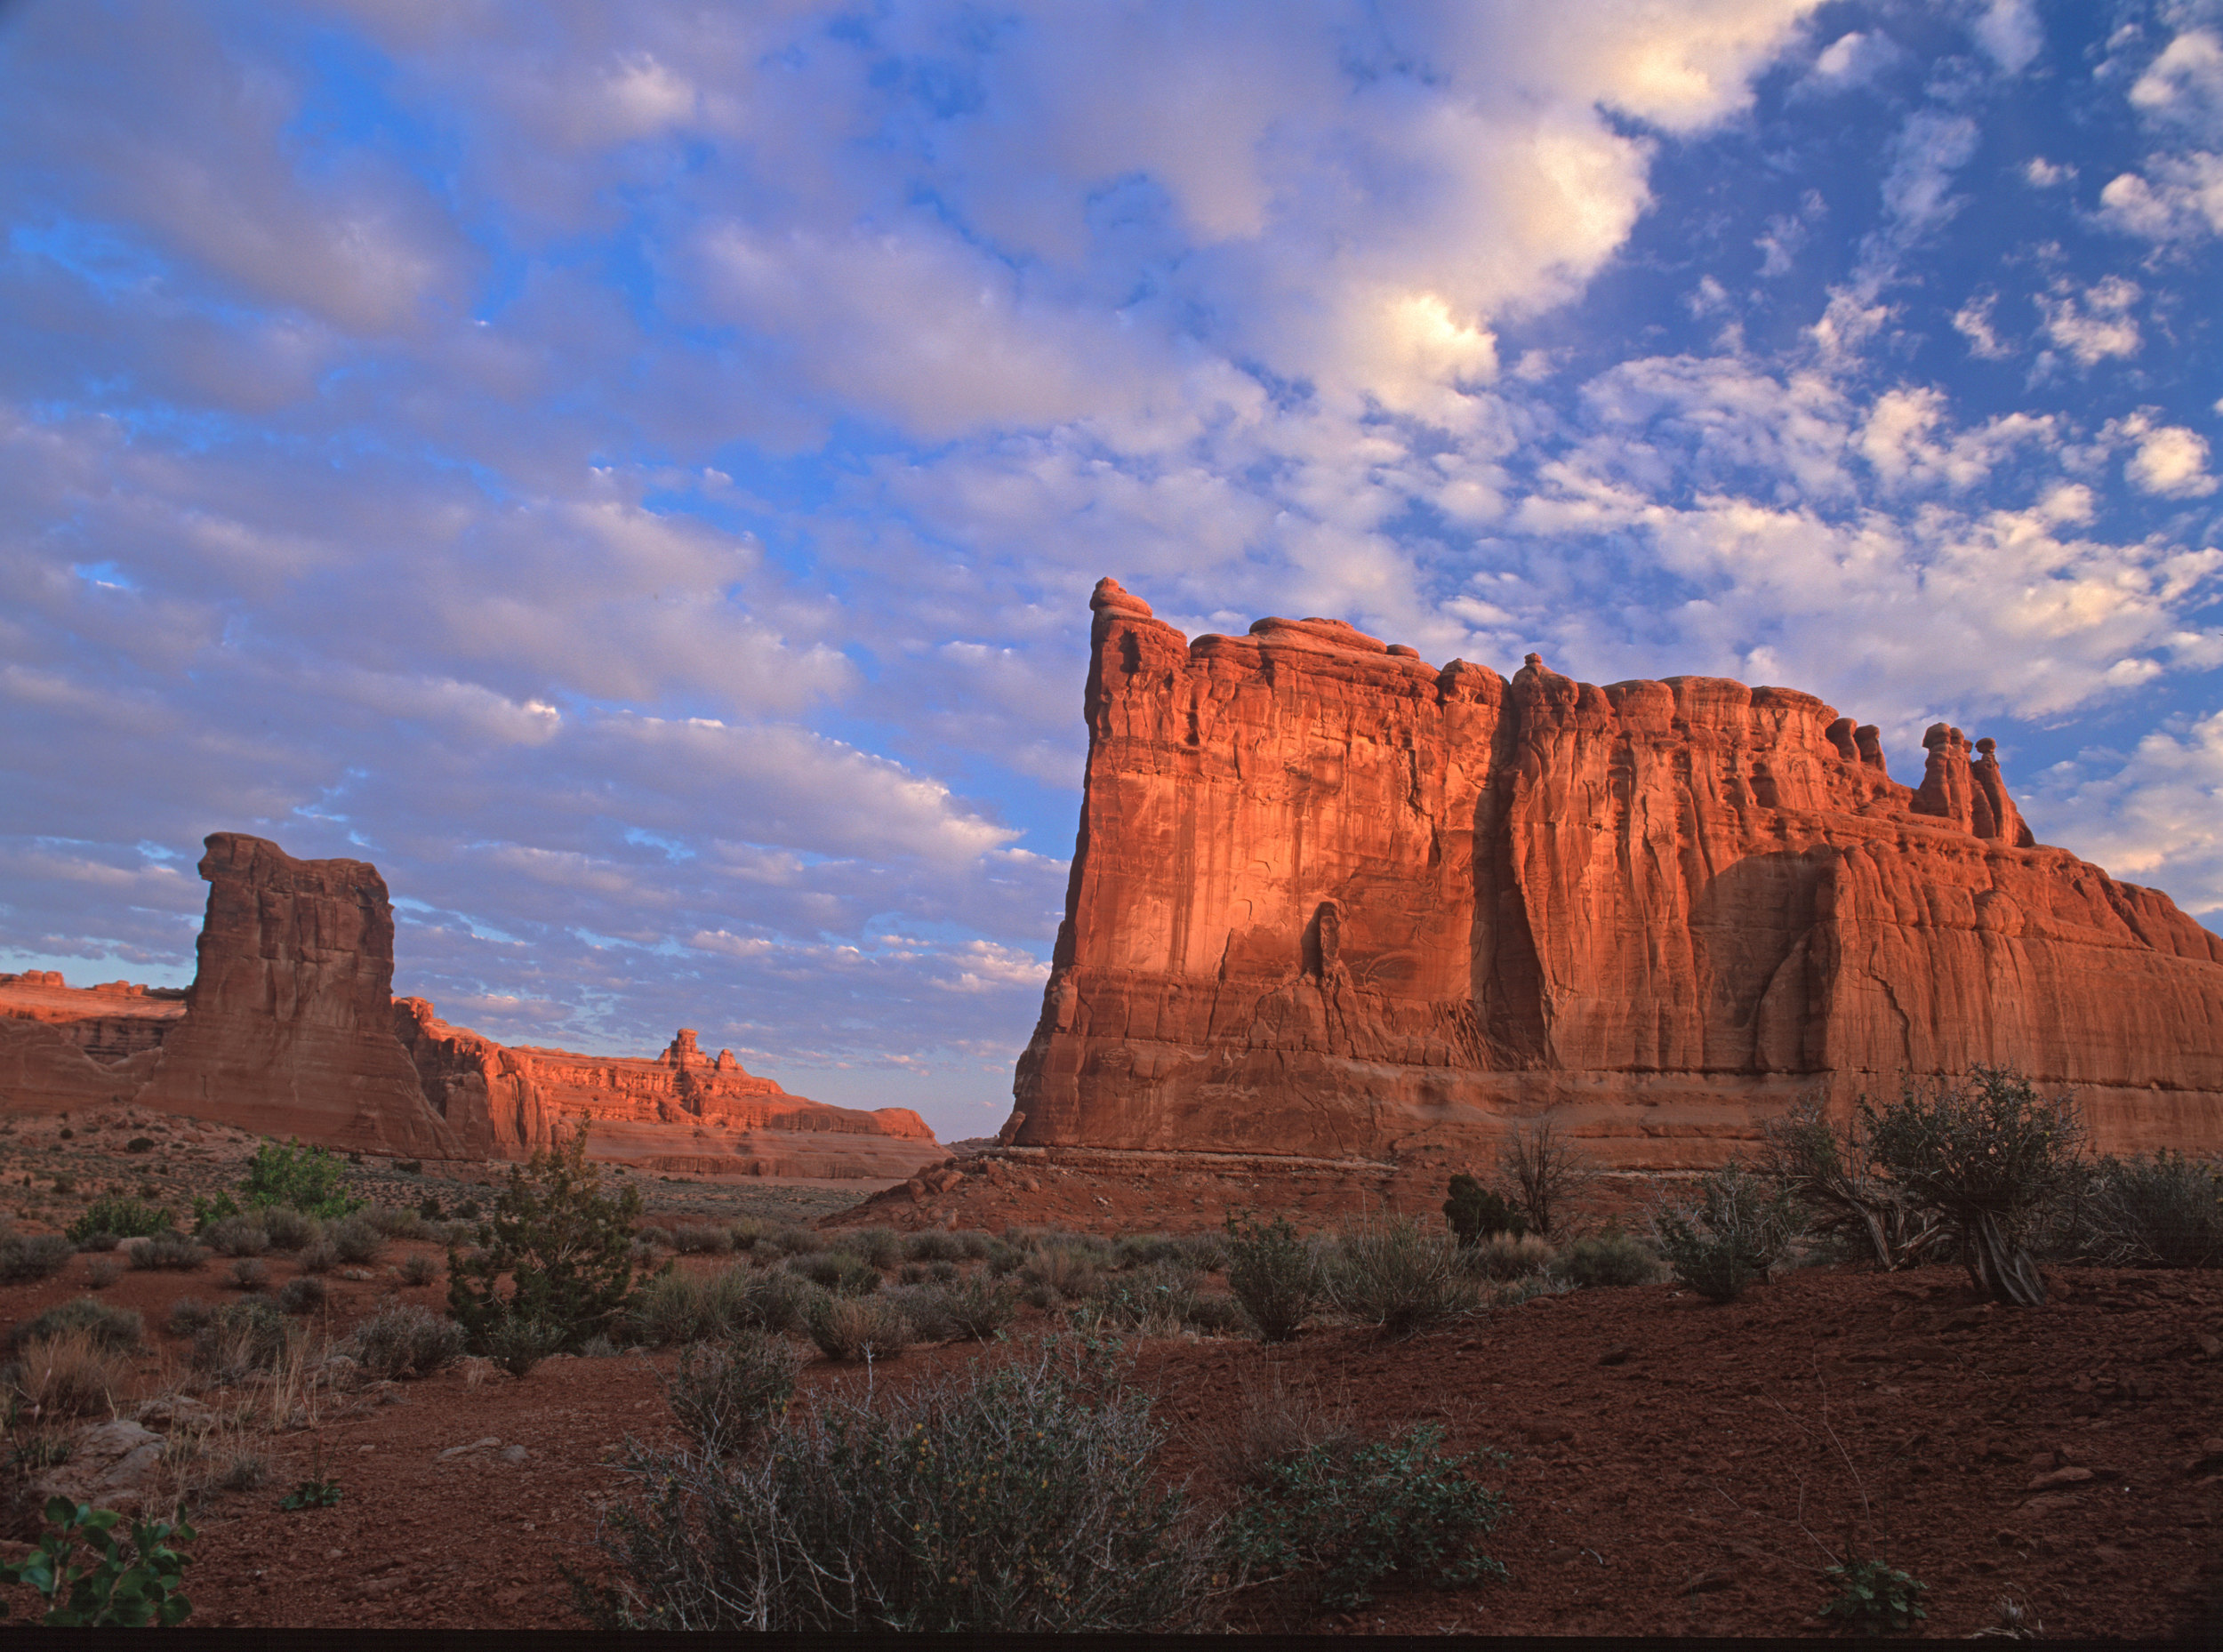 040517-Arches-at-Sunrise.jpg